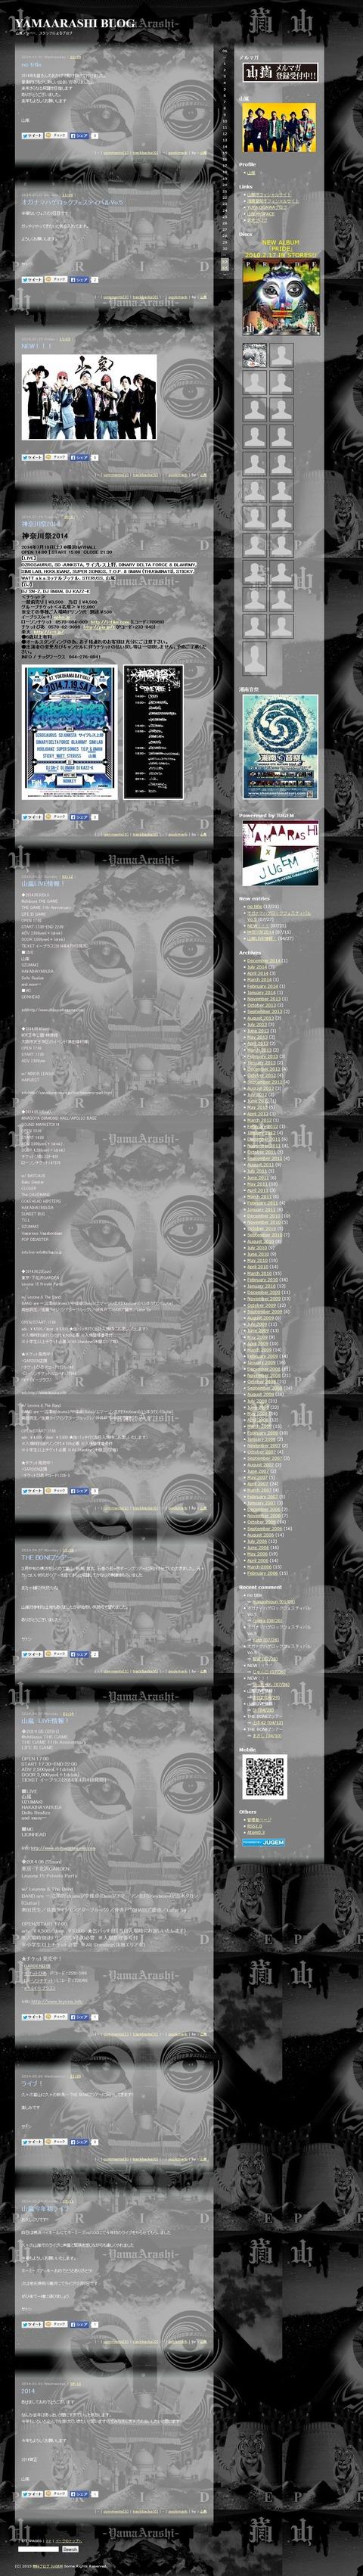 YAMAARASHI BLOG  ロックバンド 山嵐の公式ブログ